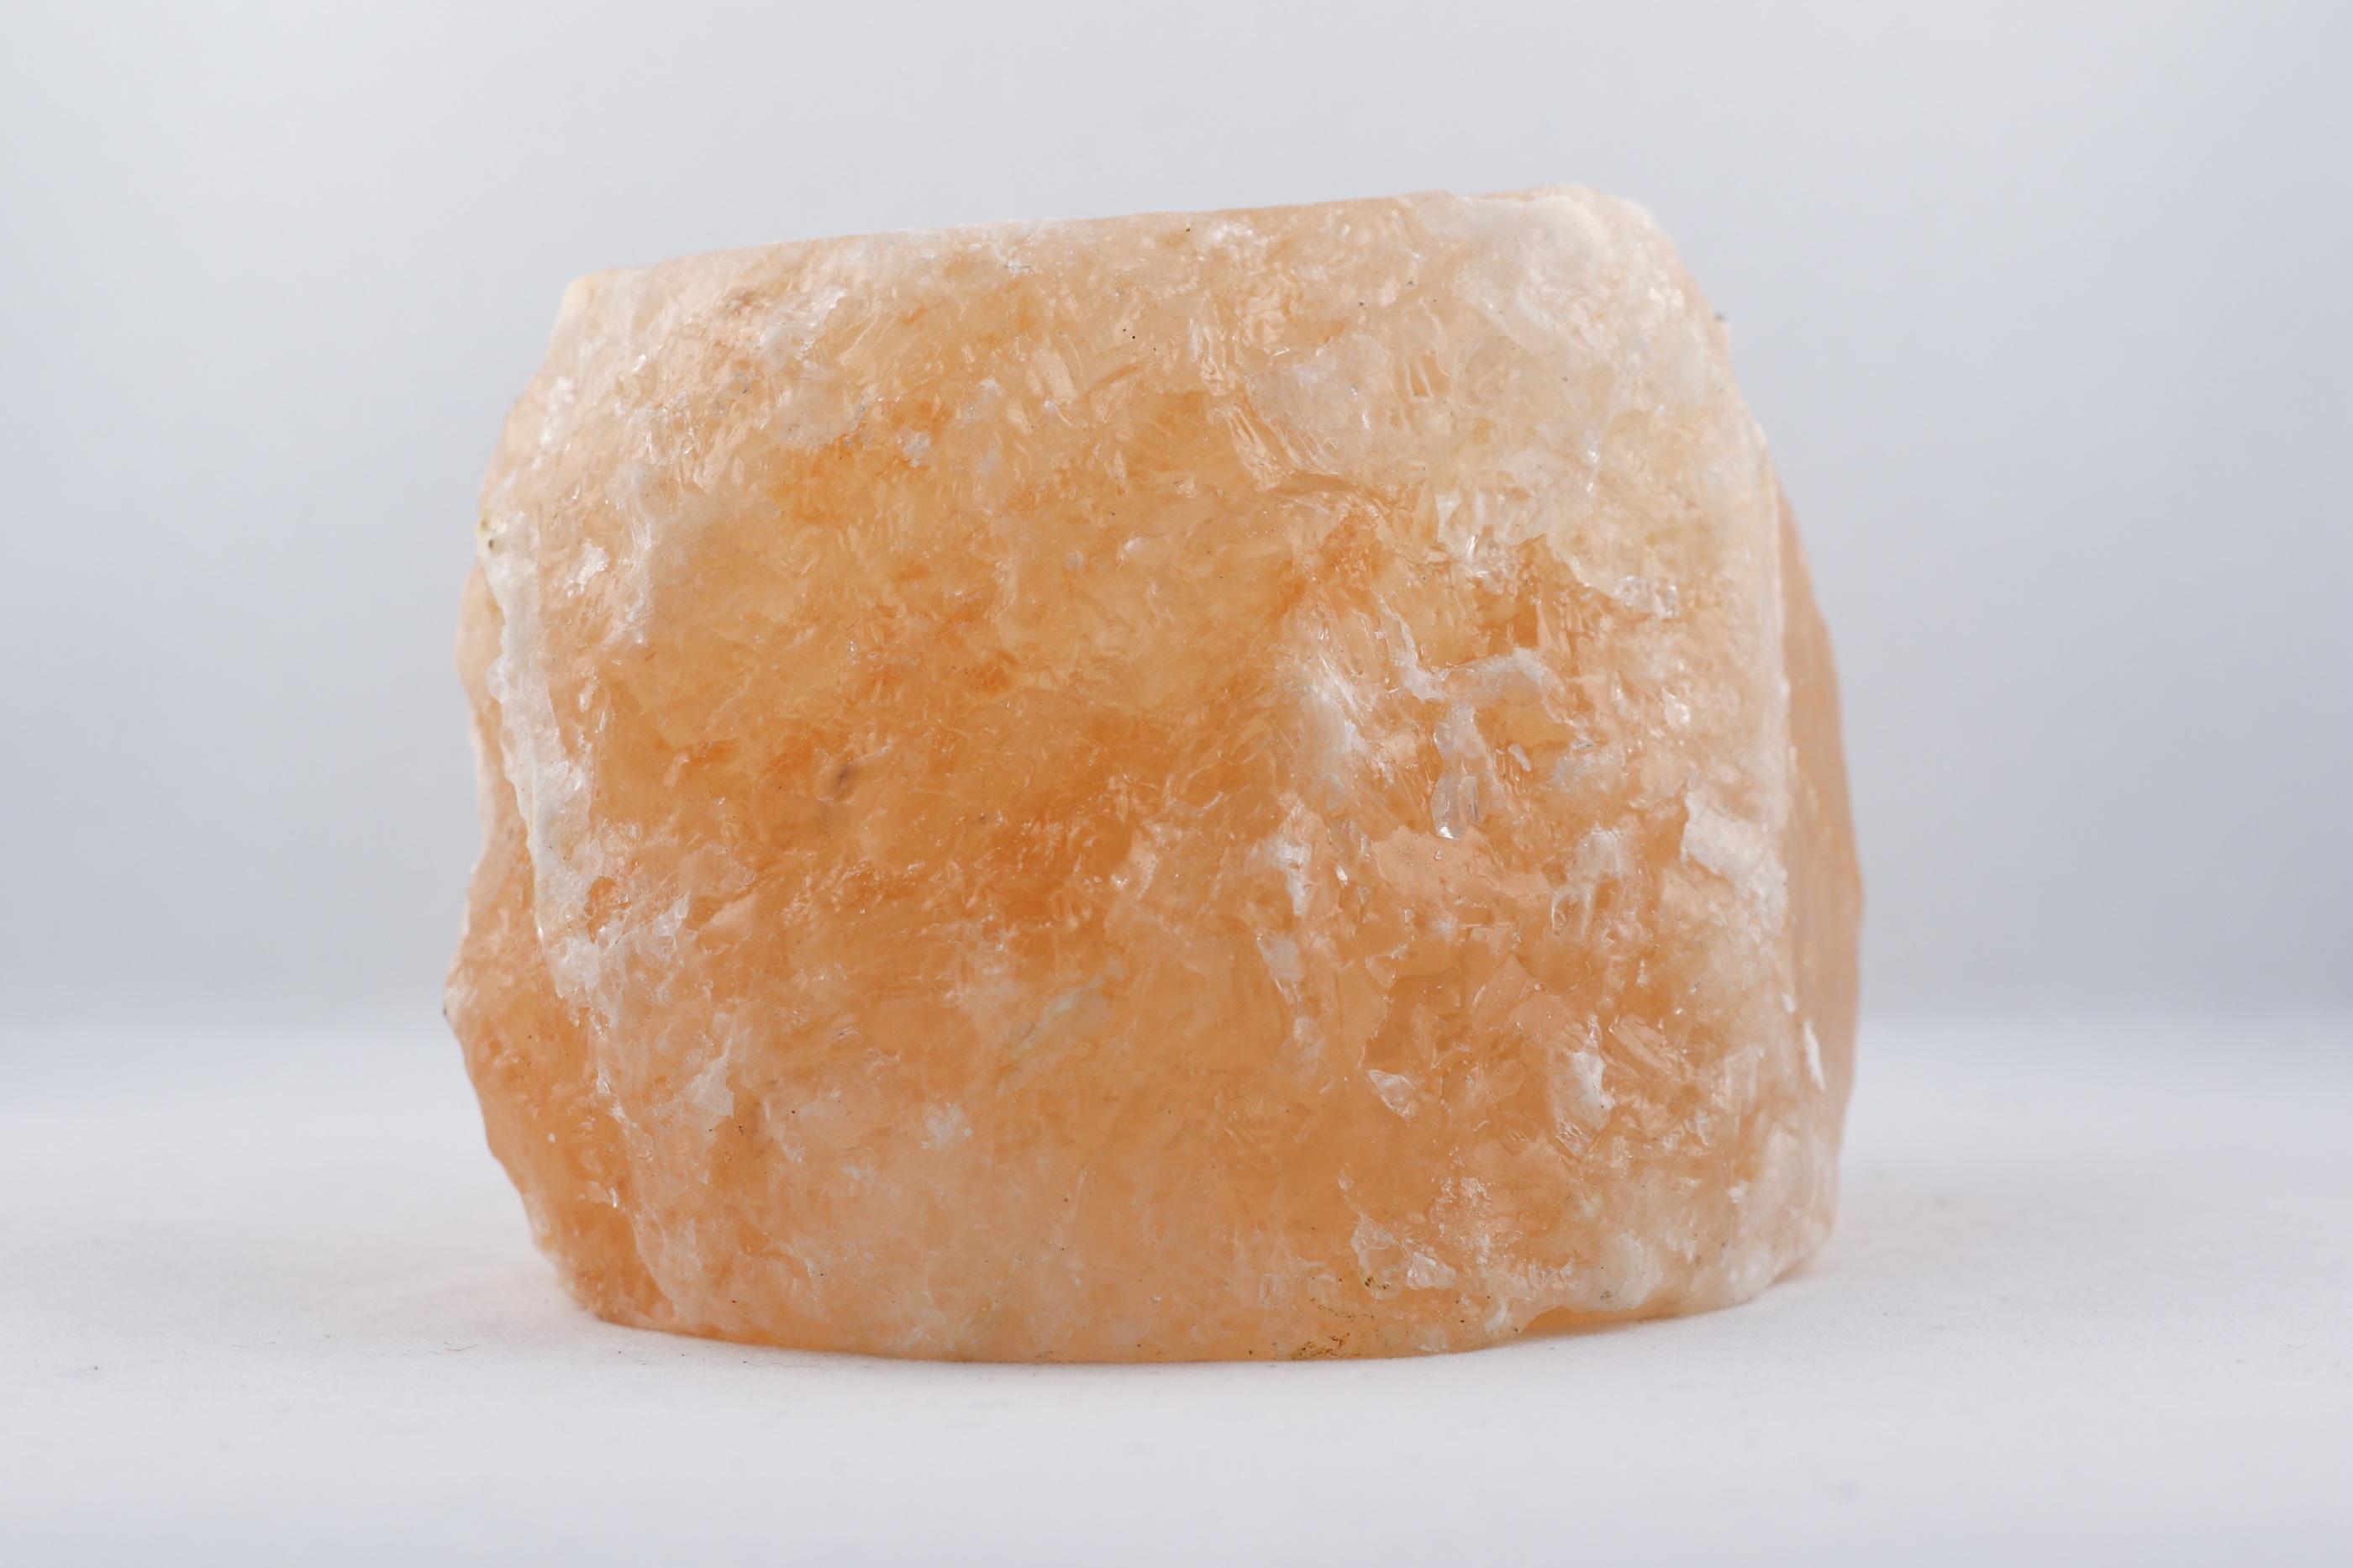 Himalaya Salt värmeljushållare wellness ayurveda halmstad sweden svensk